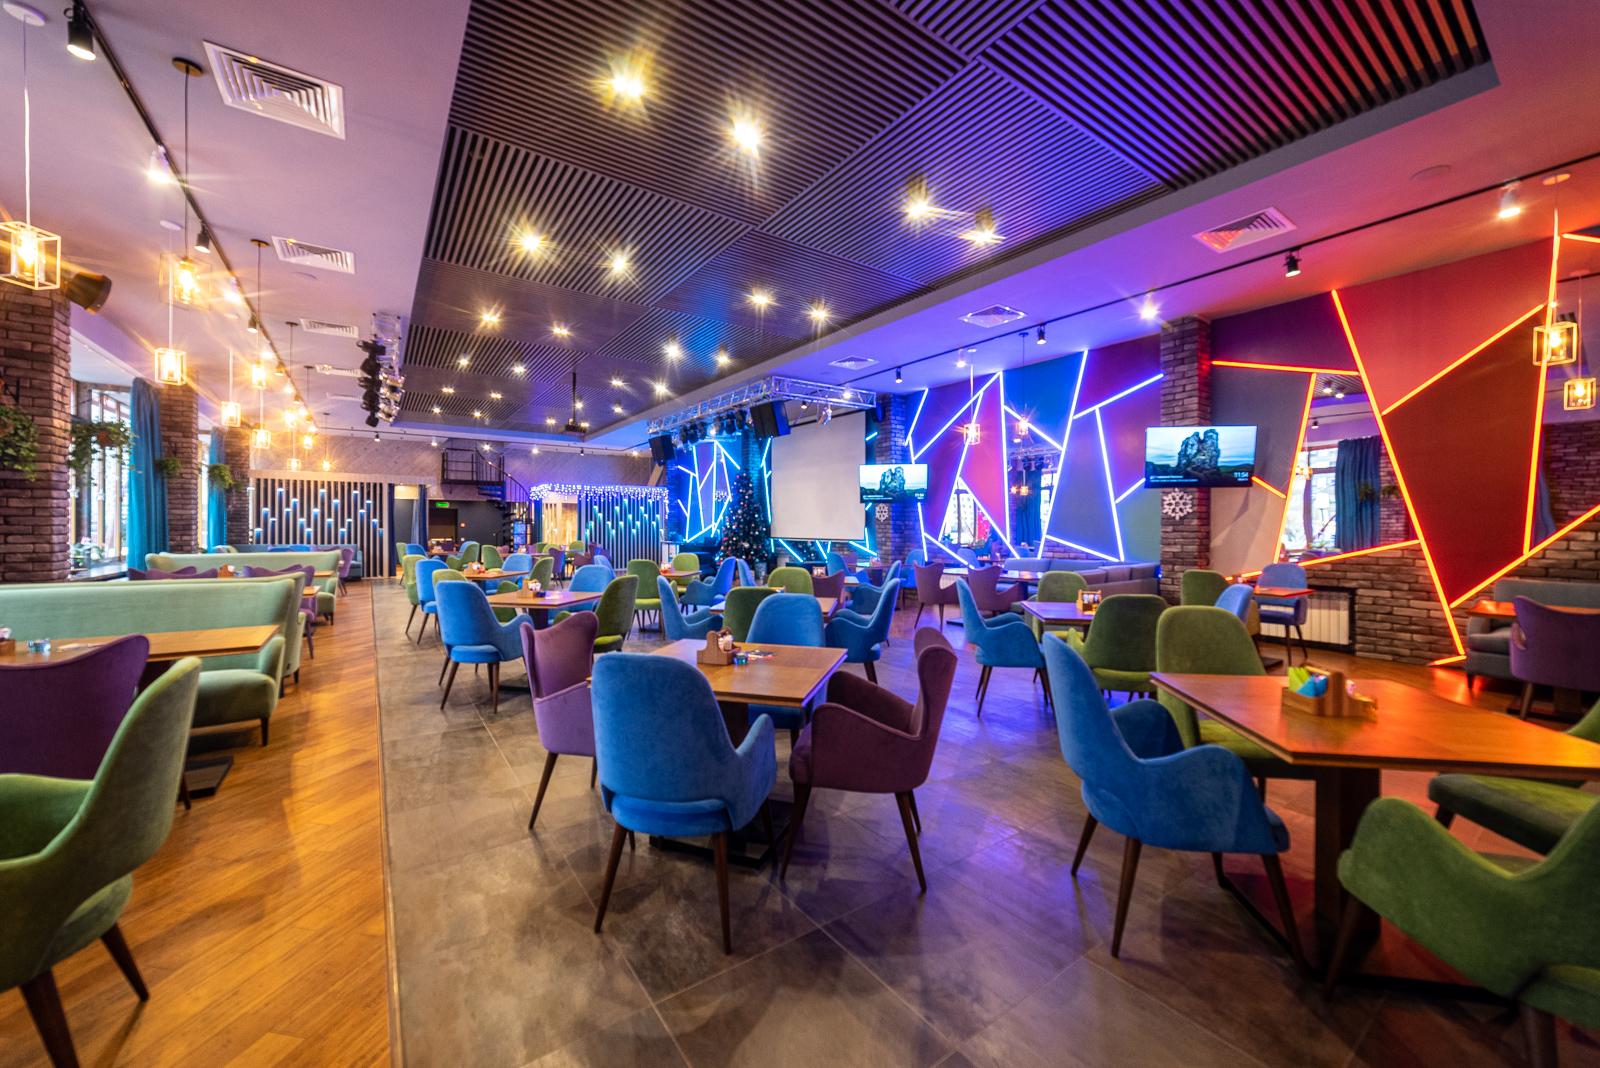 ресторан-бар, проект ресторана под ключ, дизайн ресторана в стиле лофт, дизайн ресторана под ключ, дизайн коммерческих помещений, дизайн интерьера, дизайн ресторана